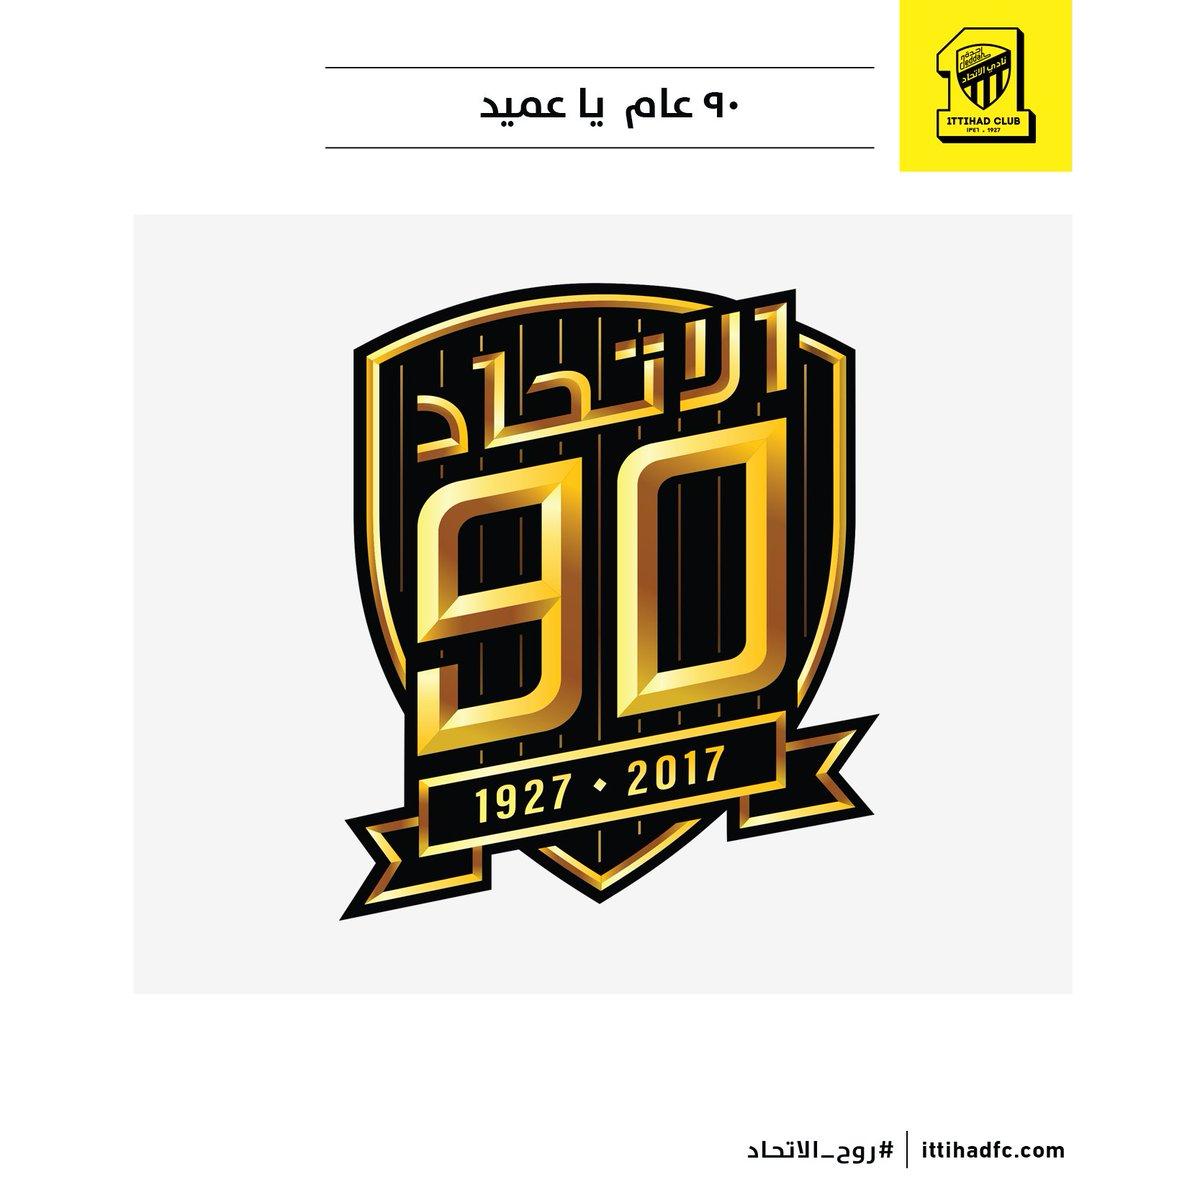 #90_عام_ياعميد: #90_عام_ياعميد